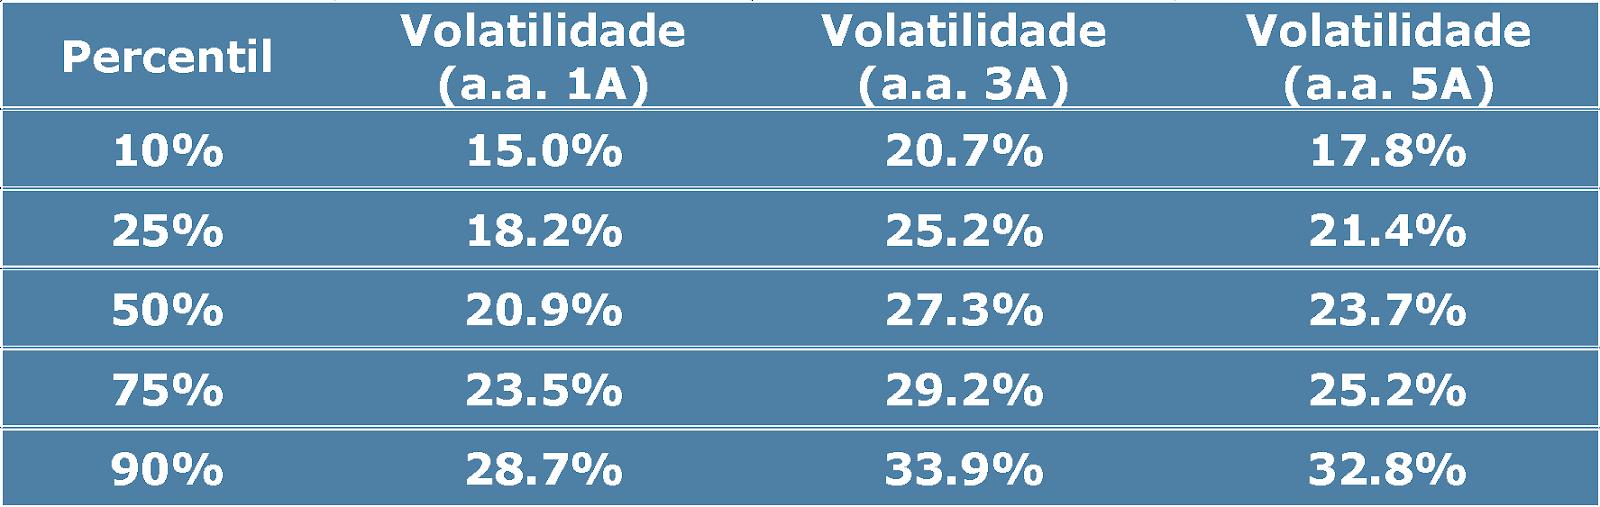 Percentis da Amostra